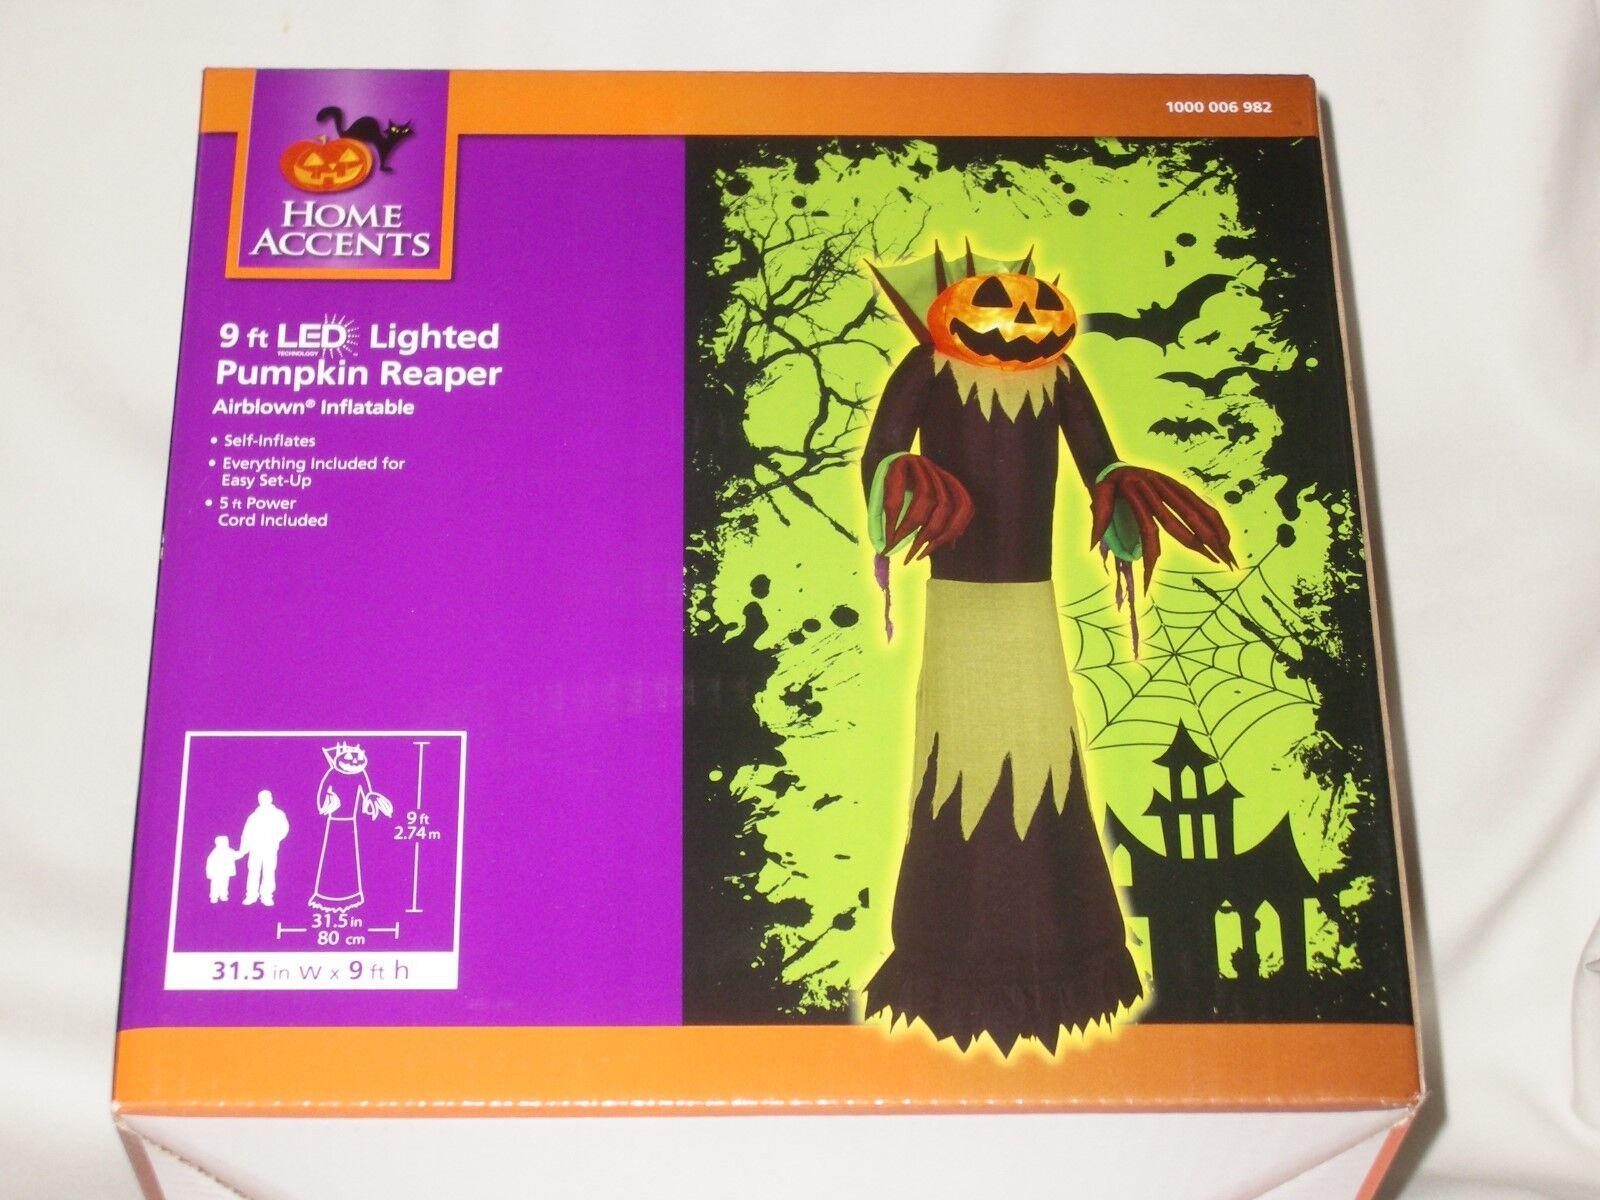 Gemmy 9' Lighted Haunted Pumpkin Reaper Halloween Airblown Inflatable Blowup